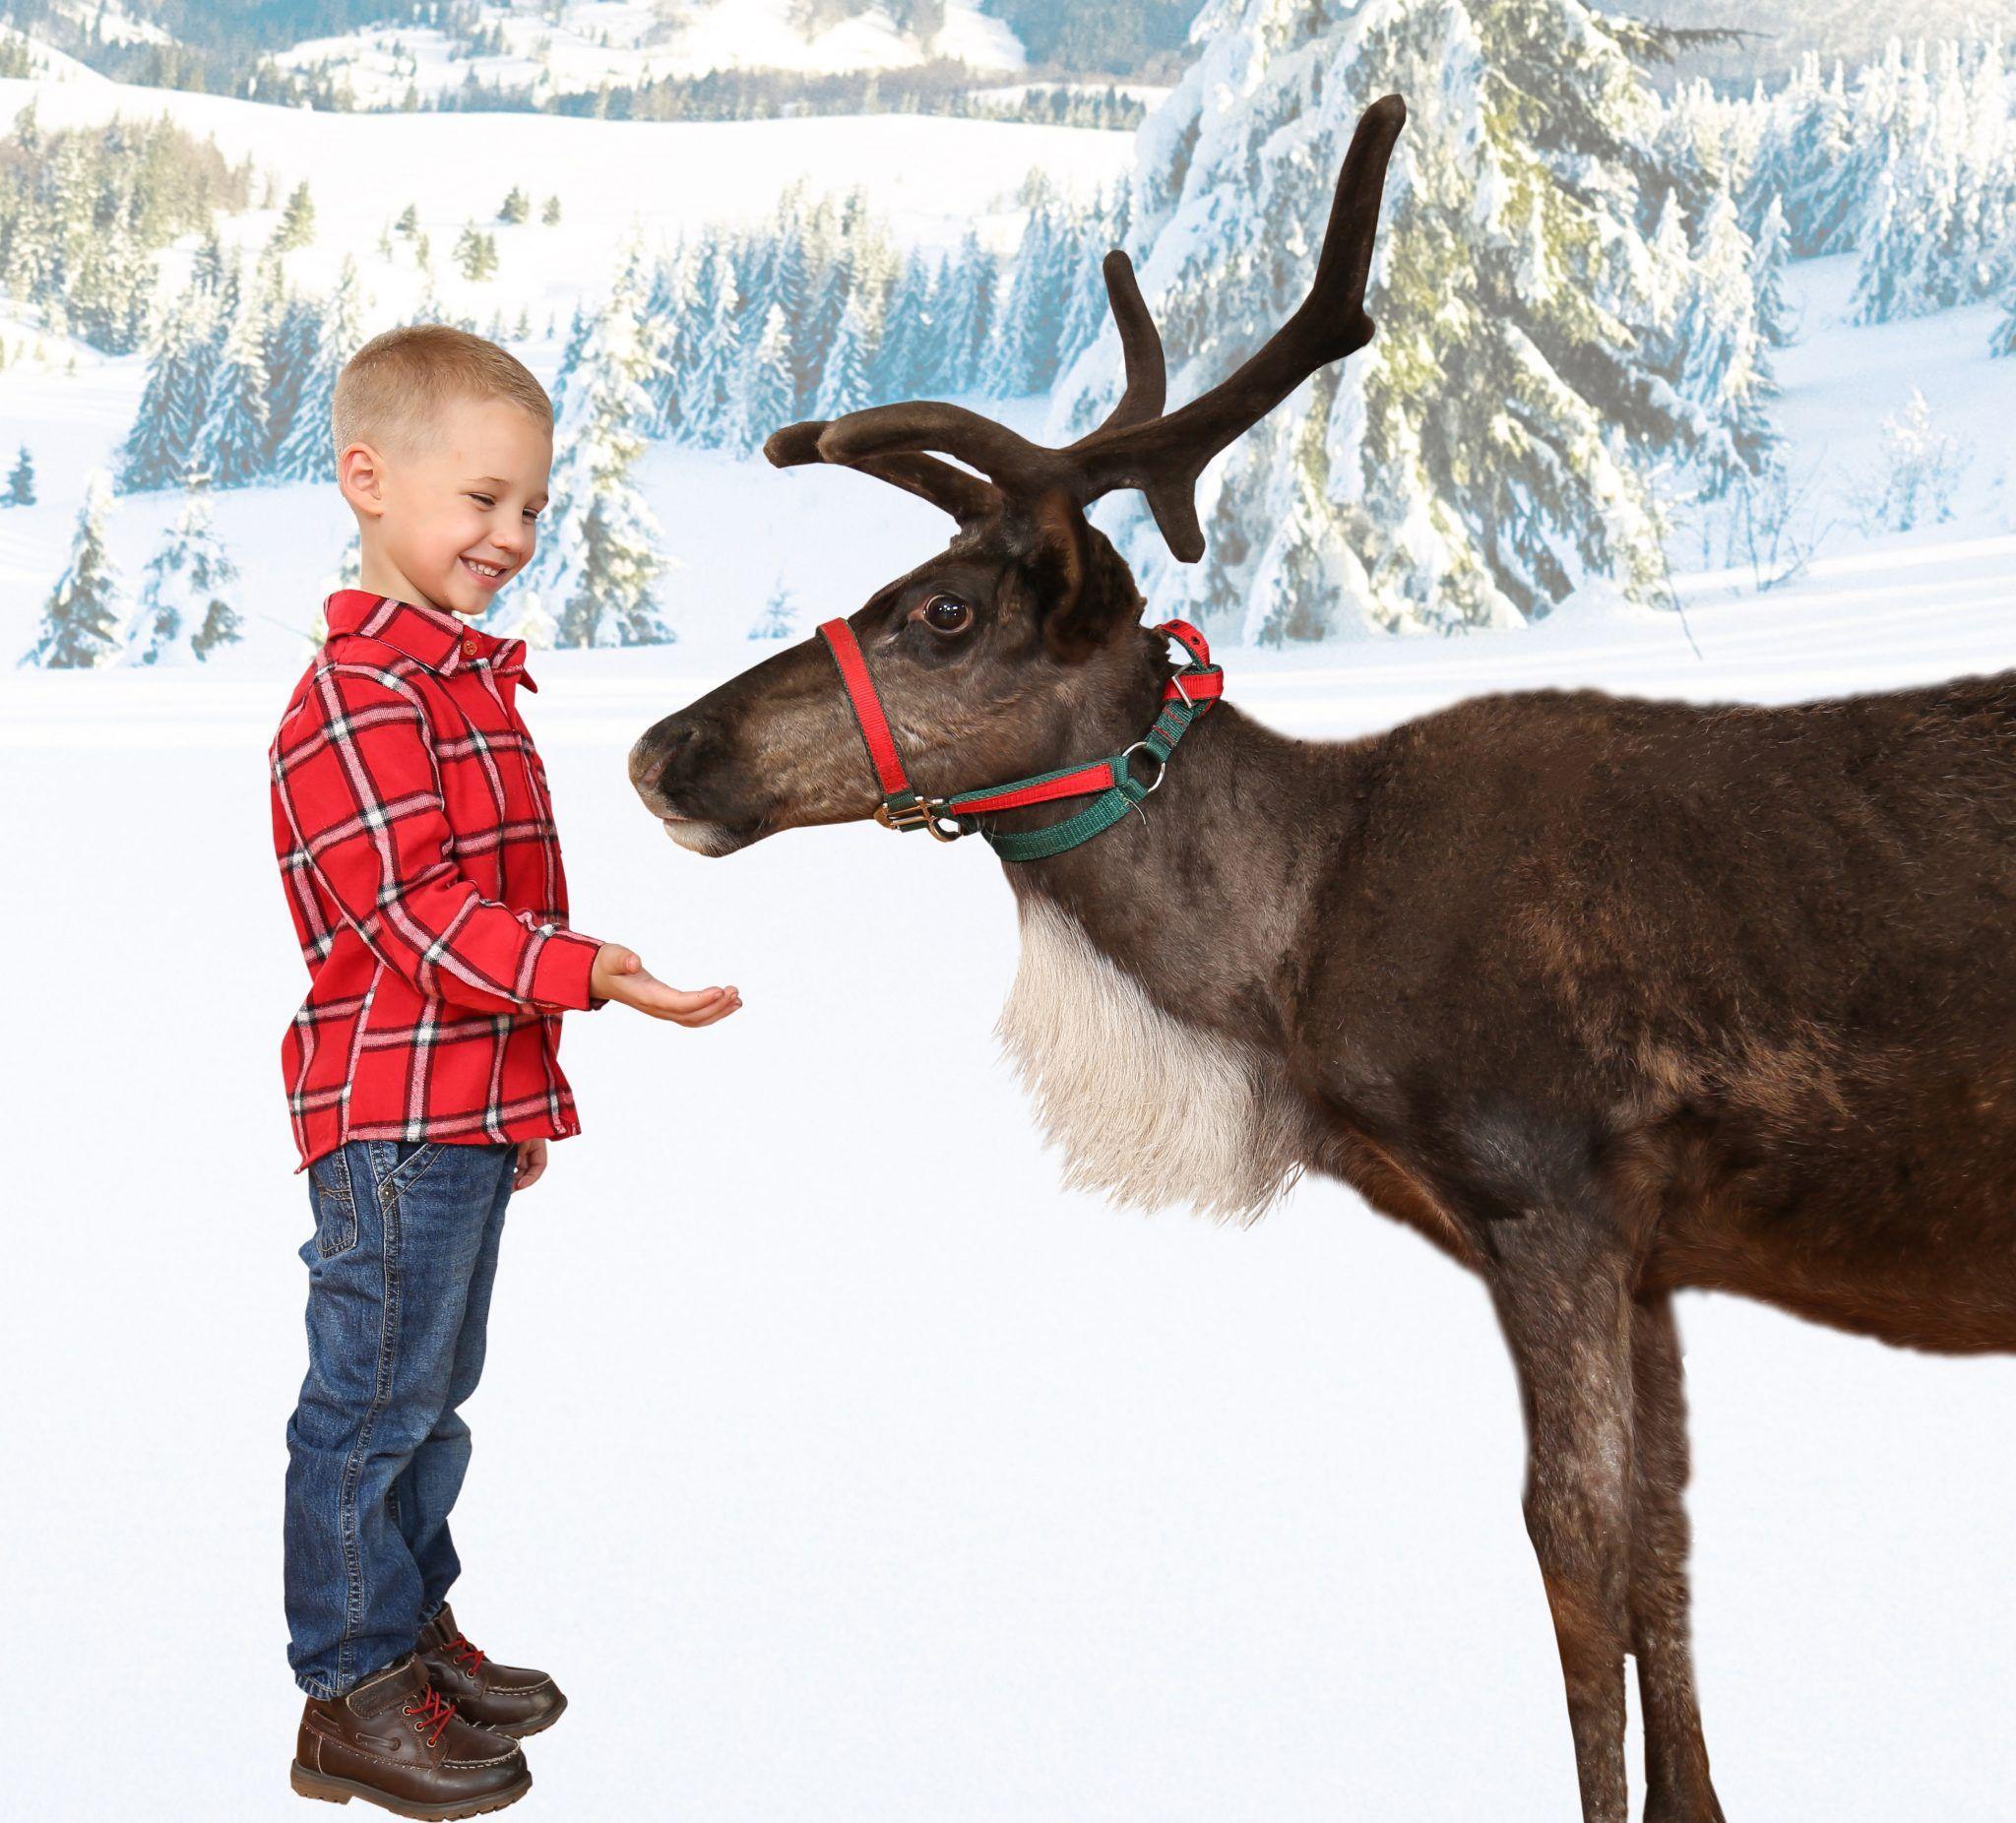 Drive Through Christmas Lights Promised Land Zoo Branson